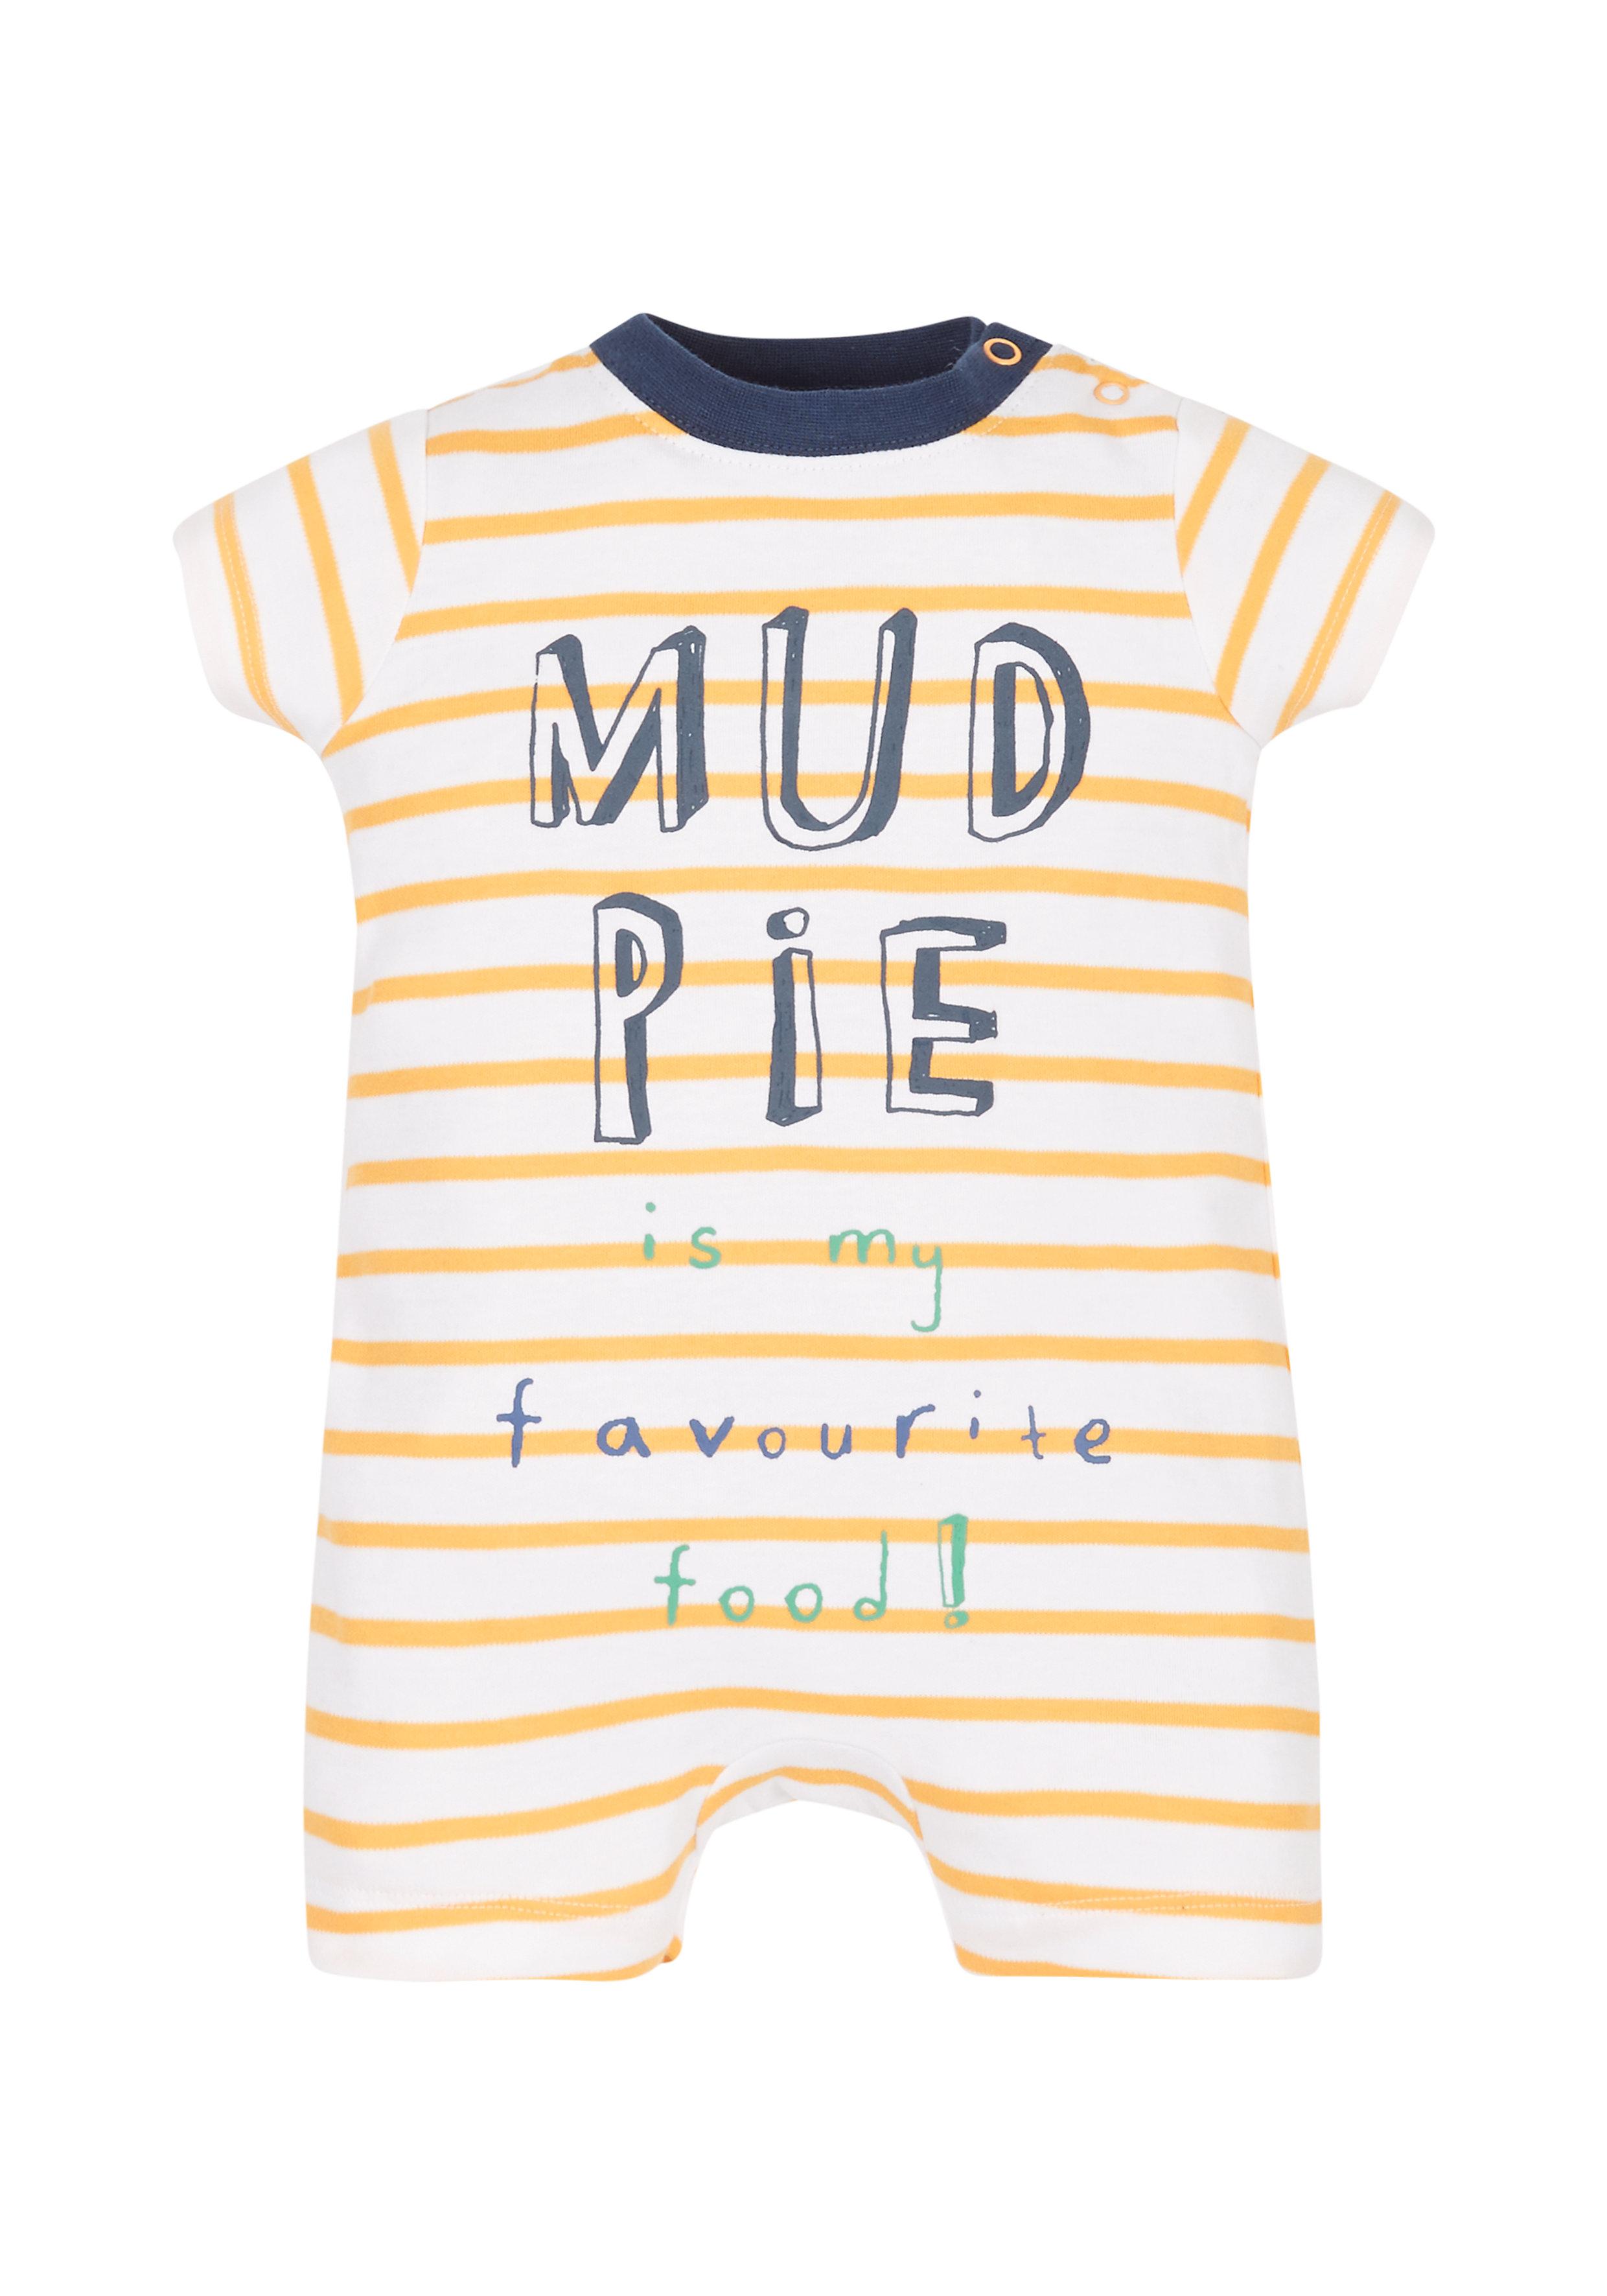 Mothercare | Boys Mud Pie Romper  - Yellow